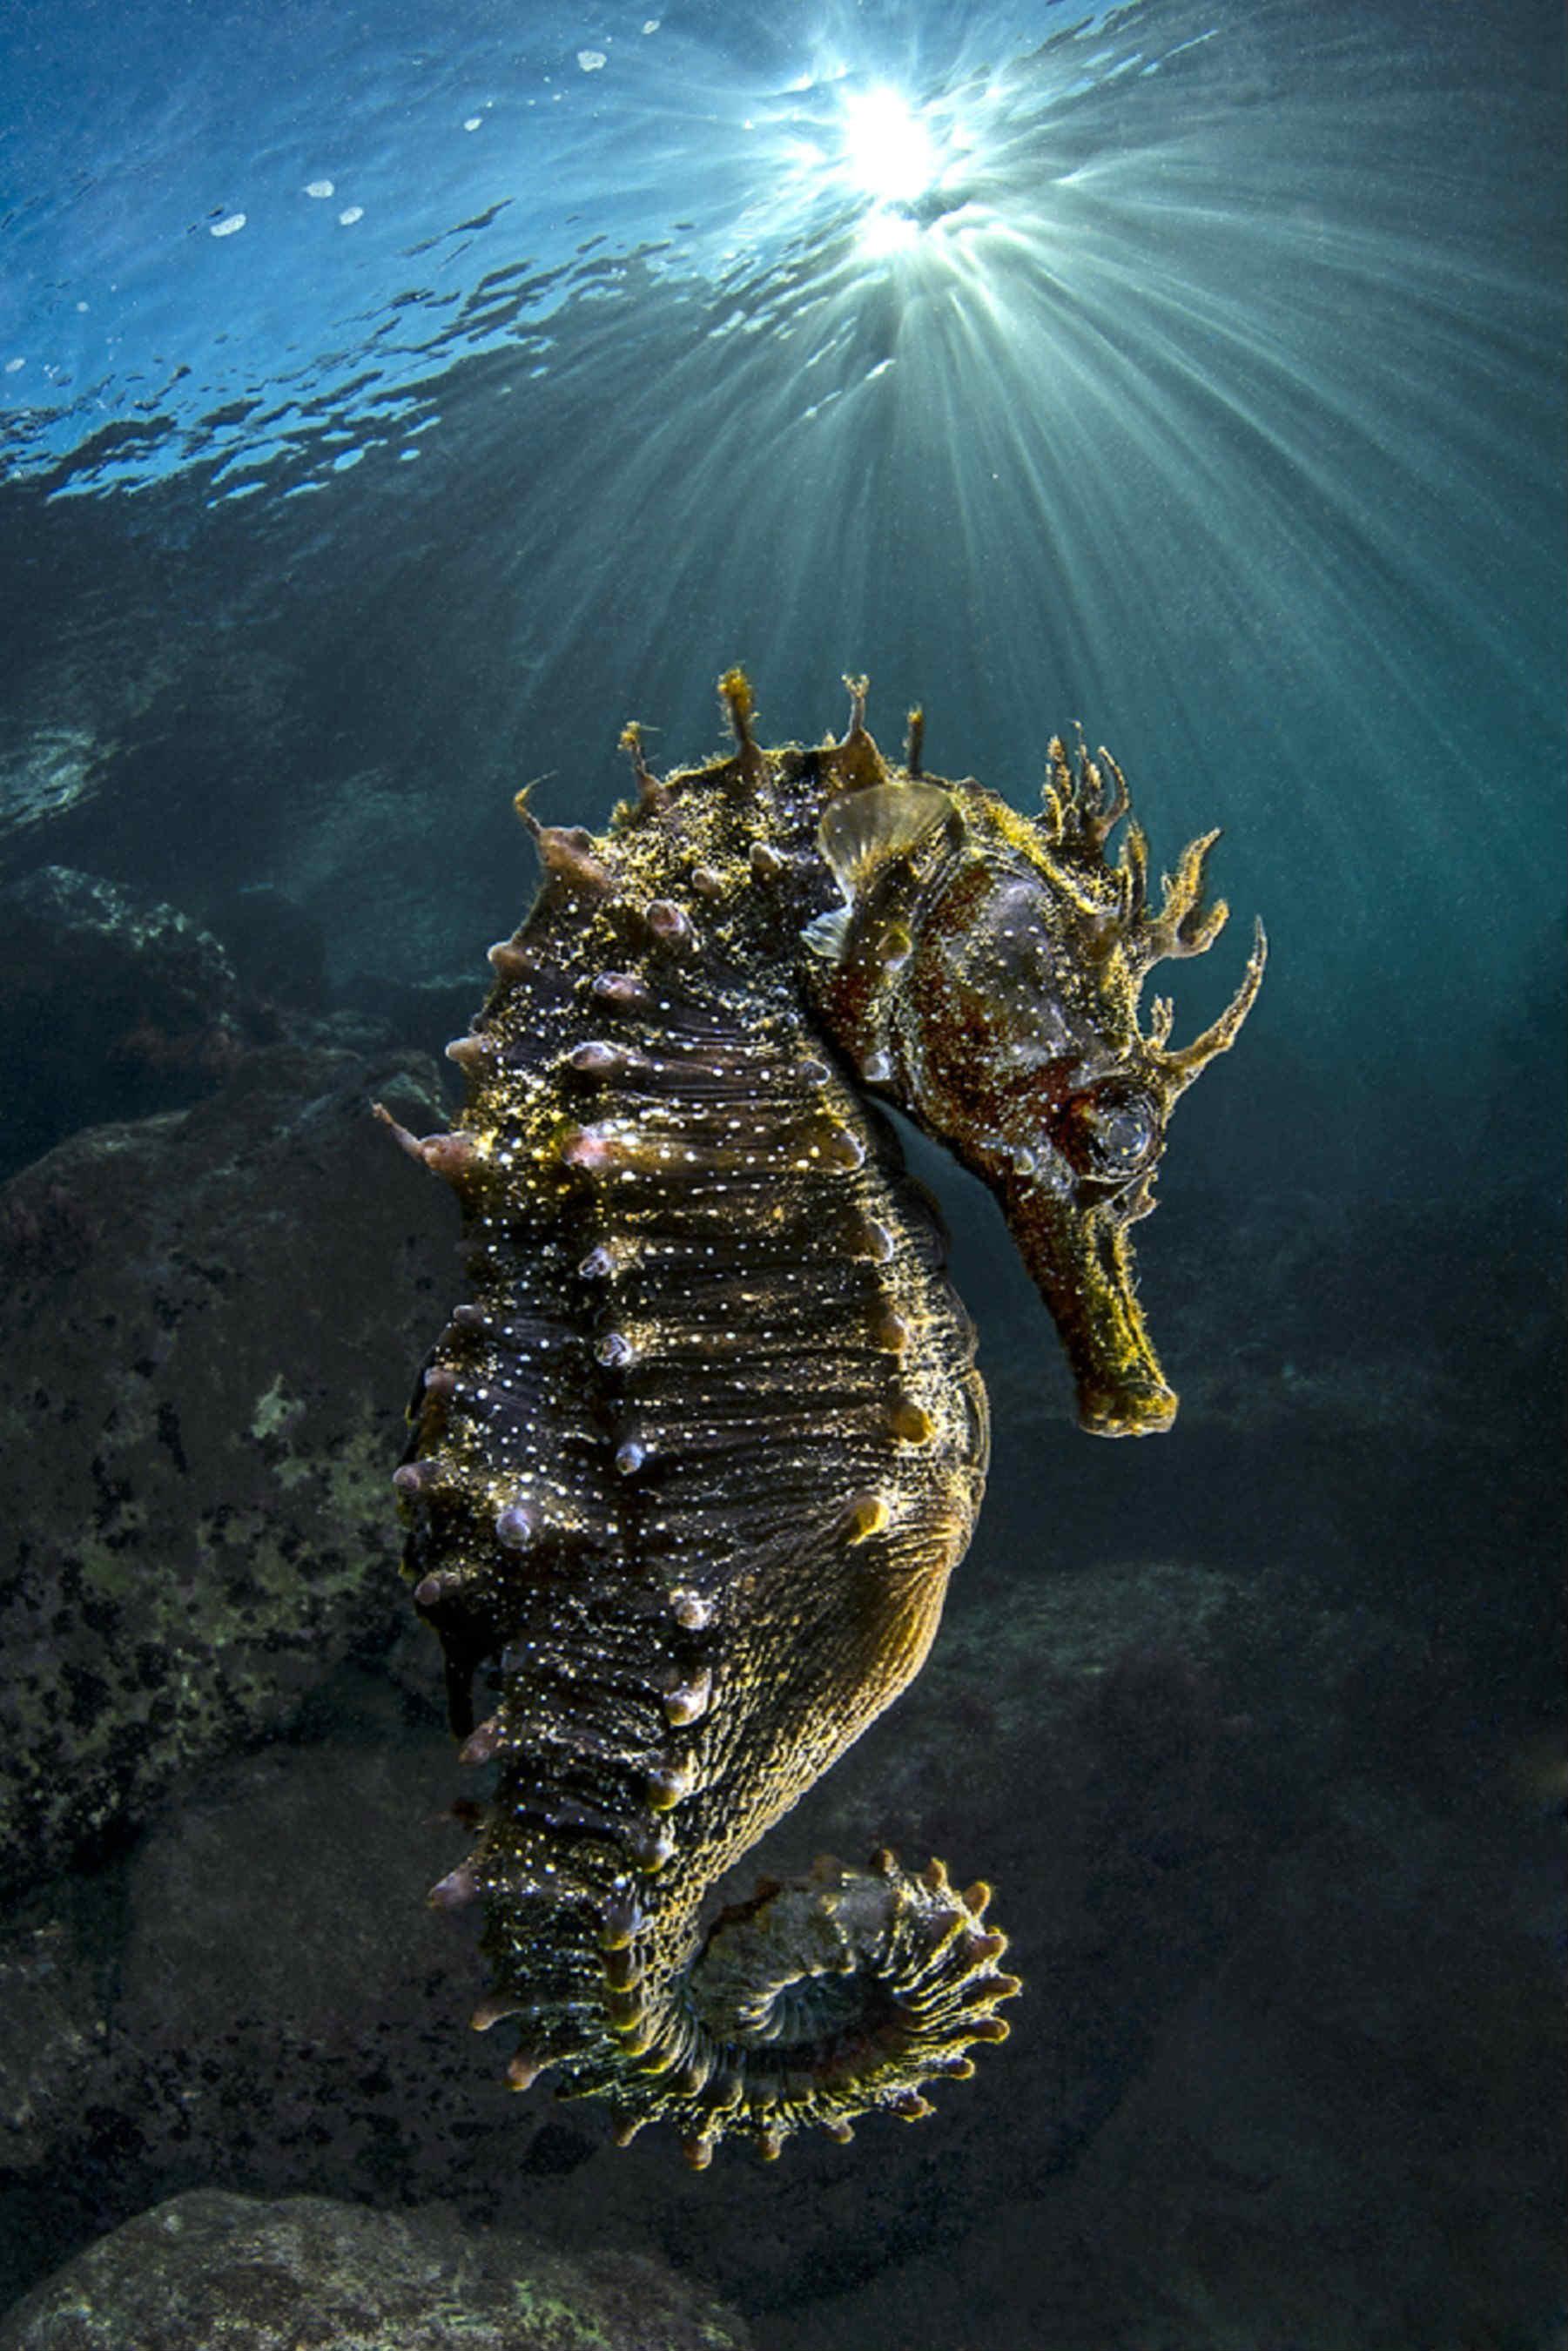 Epson Sponsors Nature's Best Photography Exhibition